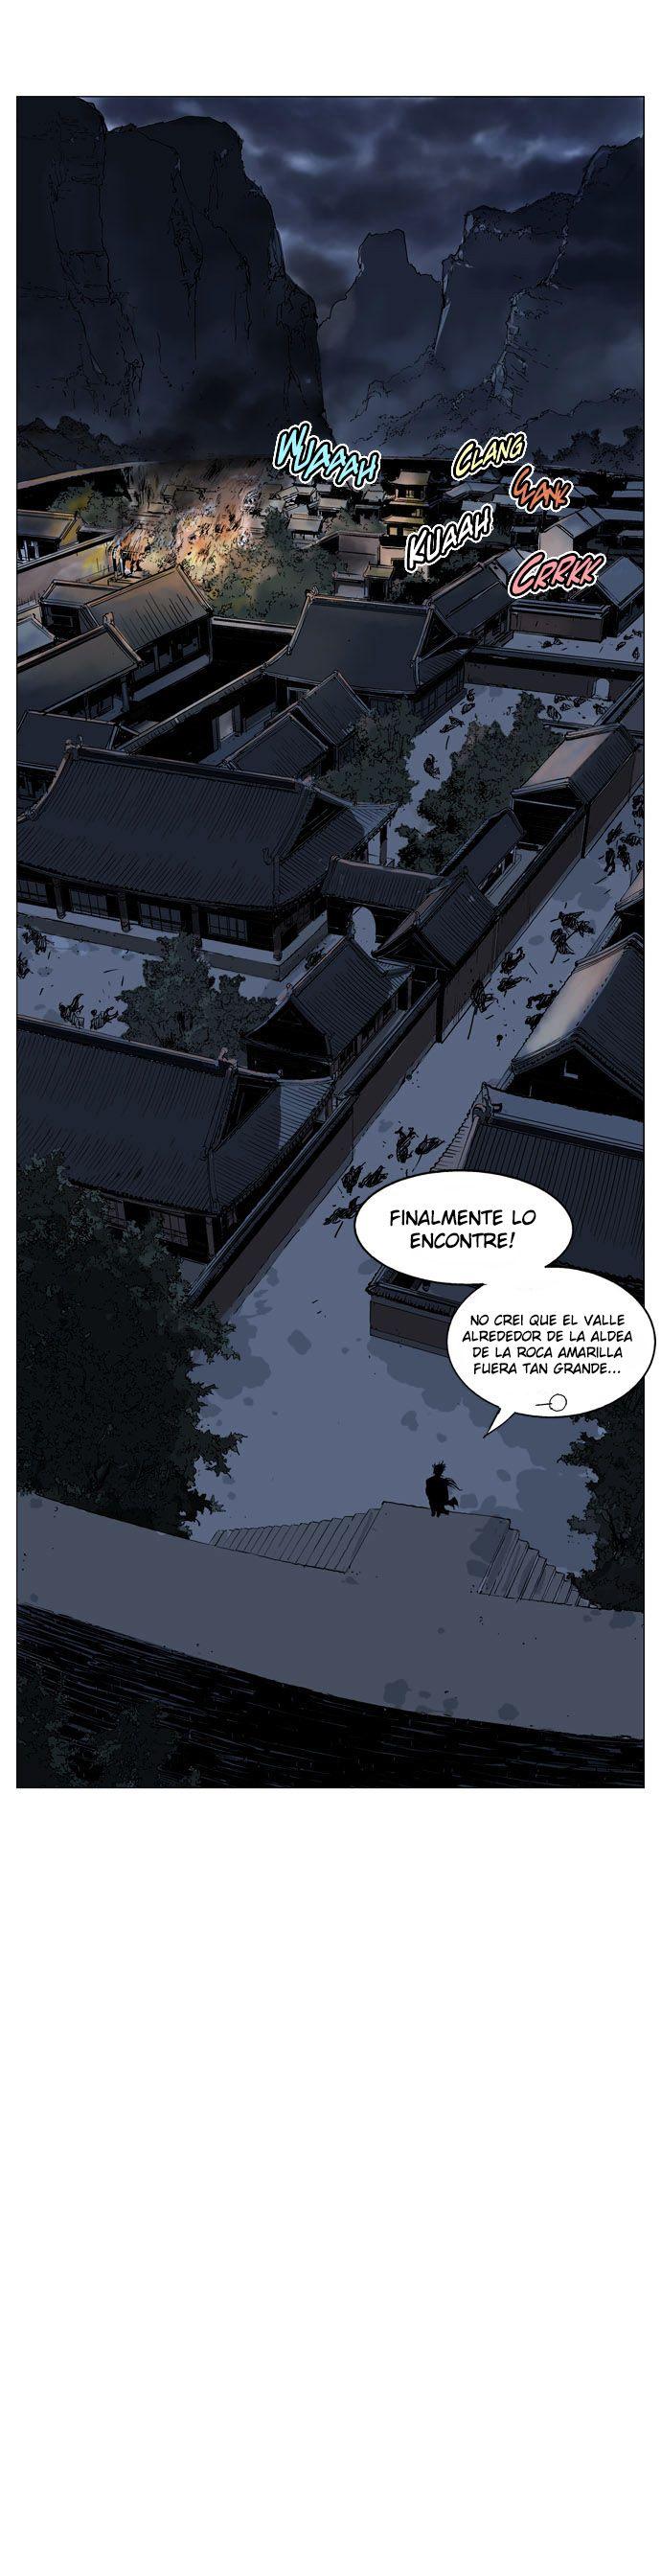 https://c5.ninemanga.com/es_manga/pic2/9/18249/518021/ab44339603db6b7d0ec51150f43a138d.jpg Page 45